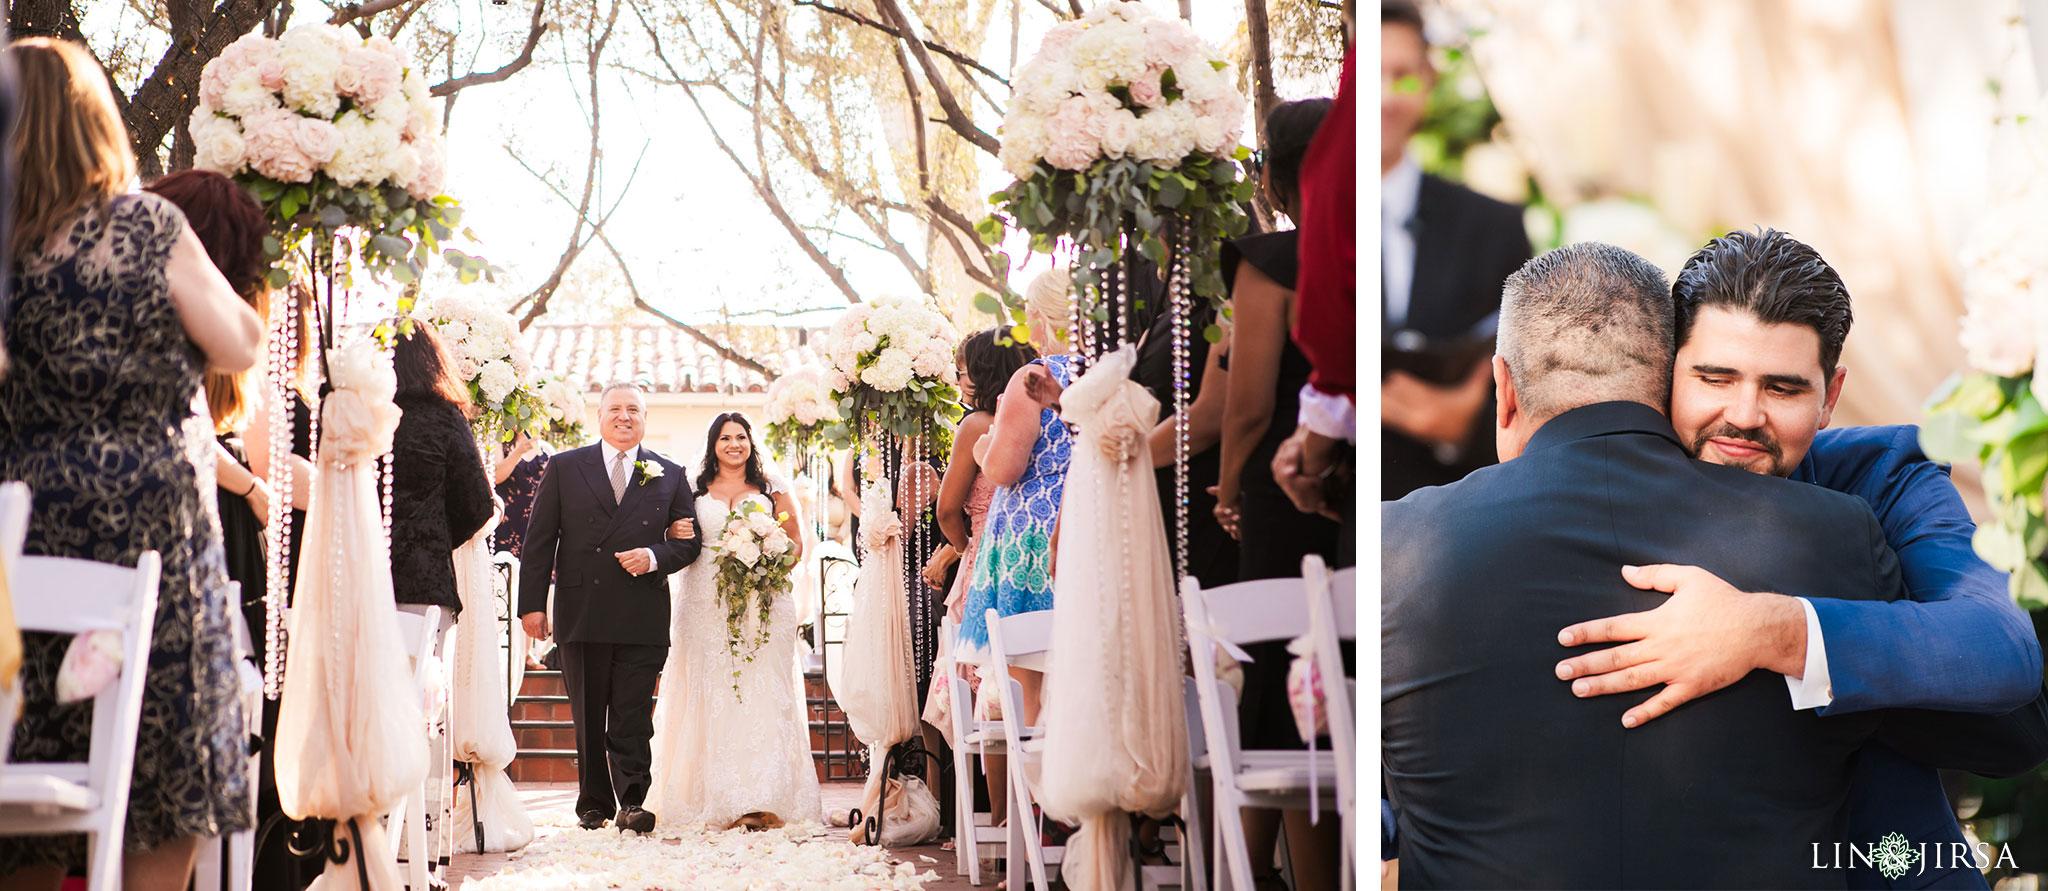 013 padua hills claremont wedding ceremony photography